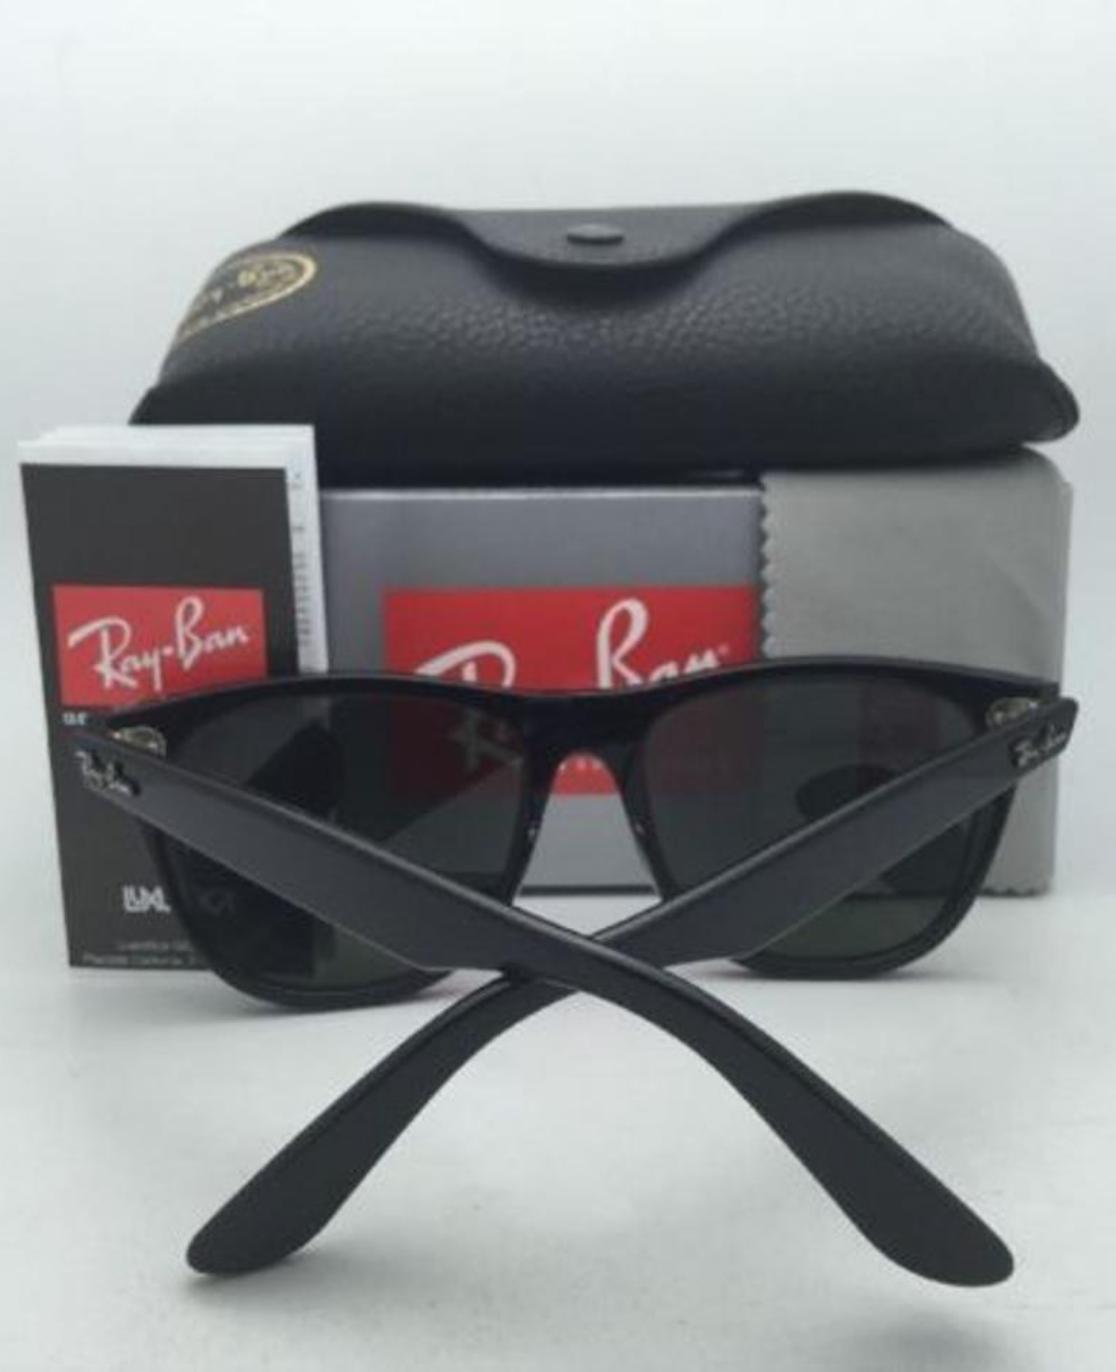 New Ray-Ban Sunglasses RB 2140 901 54-18 150 WAYFARER Black w/ G15 Green Glass